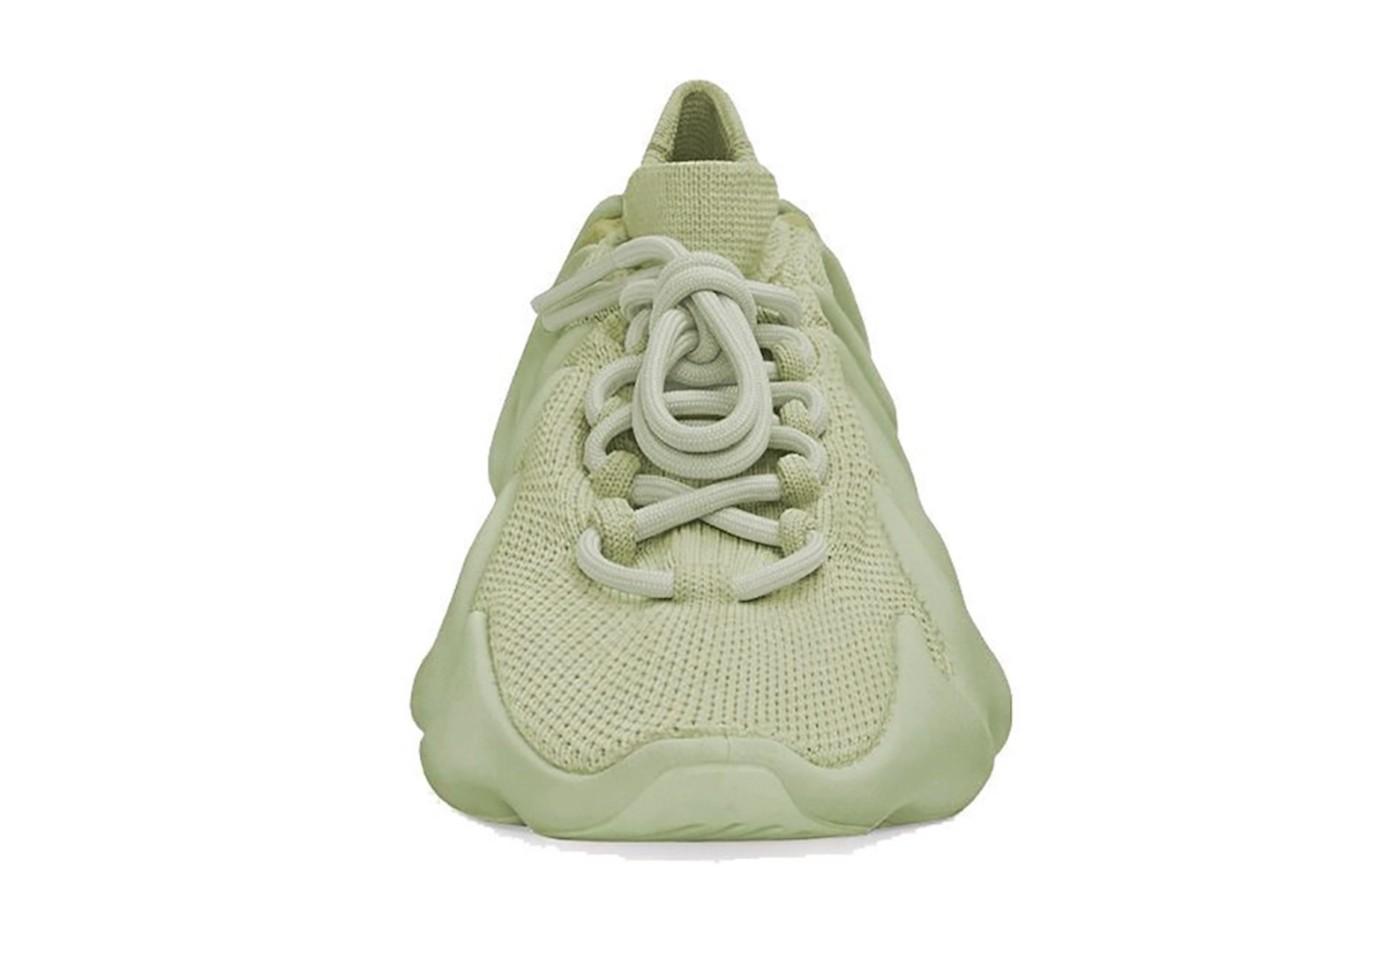 adidas,Resin,Yeezy 450  「小笼包」又有新配色!全新 Yeezy 450 Resin 图片曝光!